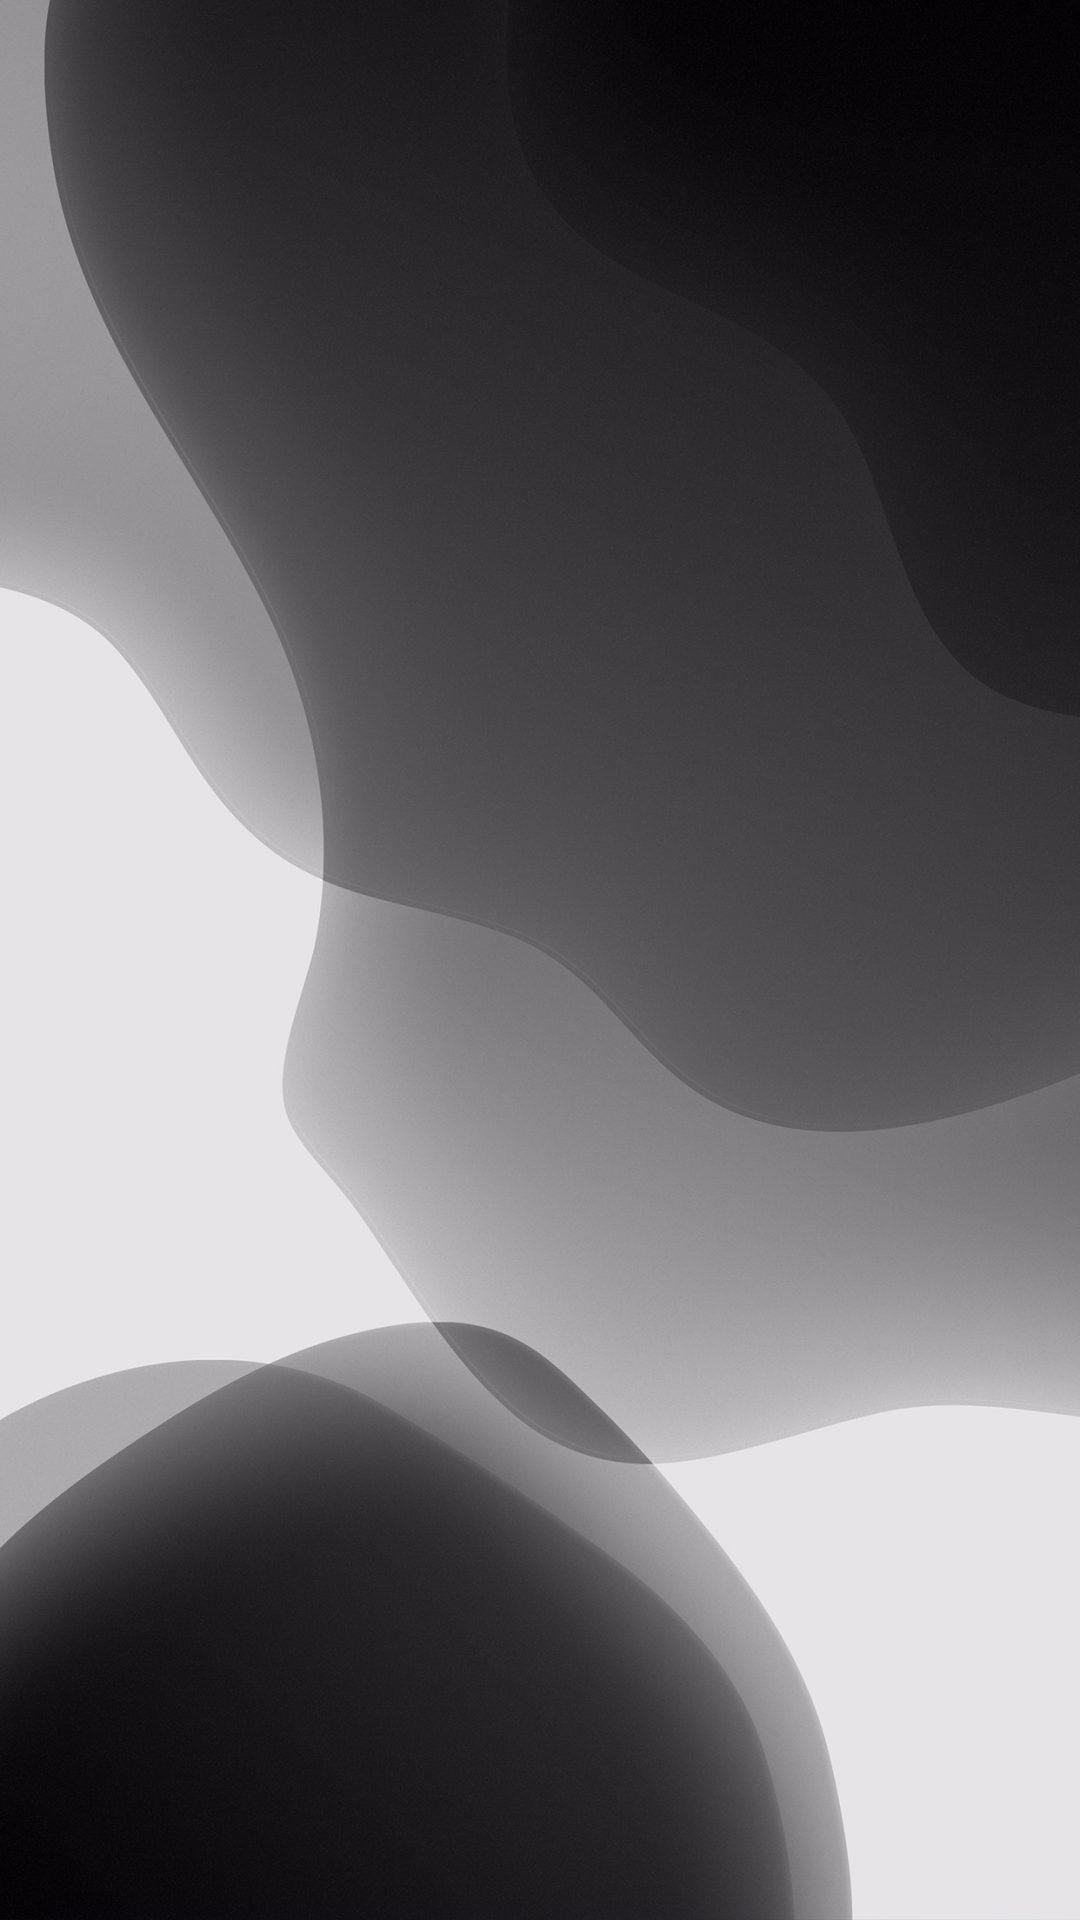 Ios 13 Stock Wallpapers 4k Download Droidviews